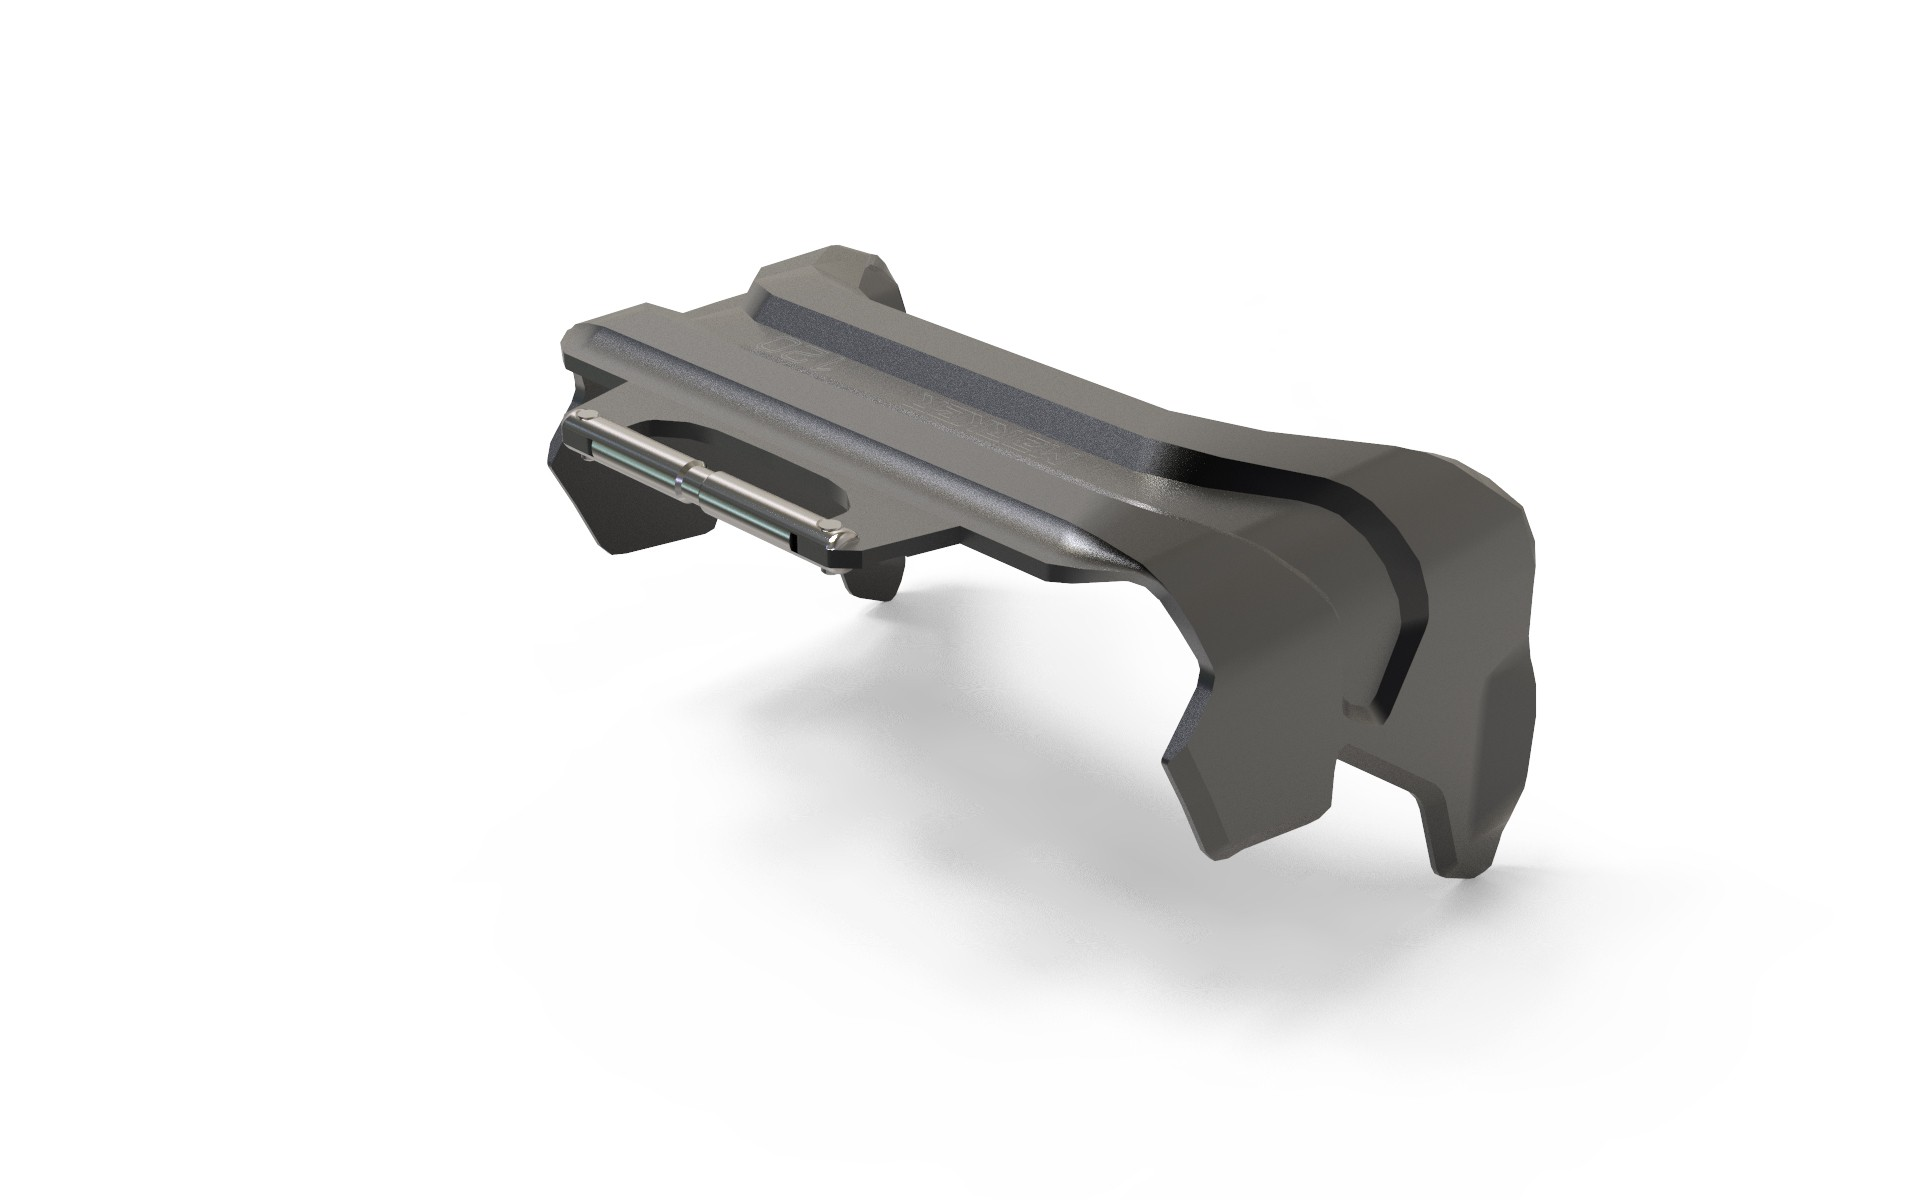 Crampon Pint 120mm (ski wth 105-120mm)